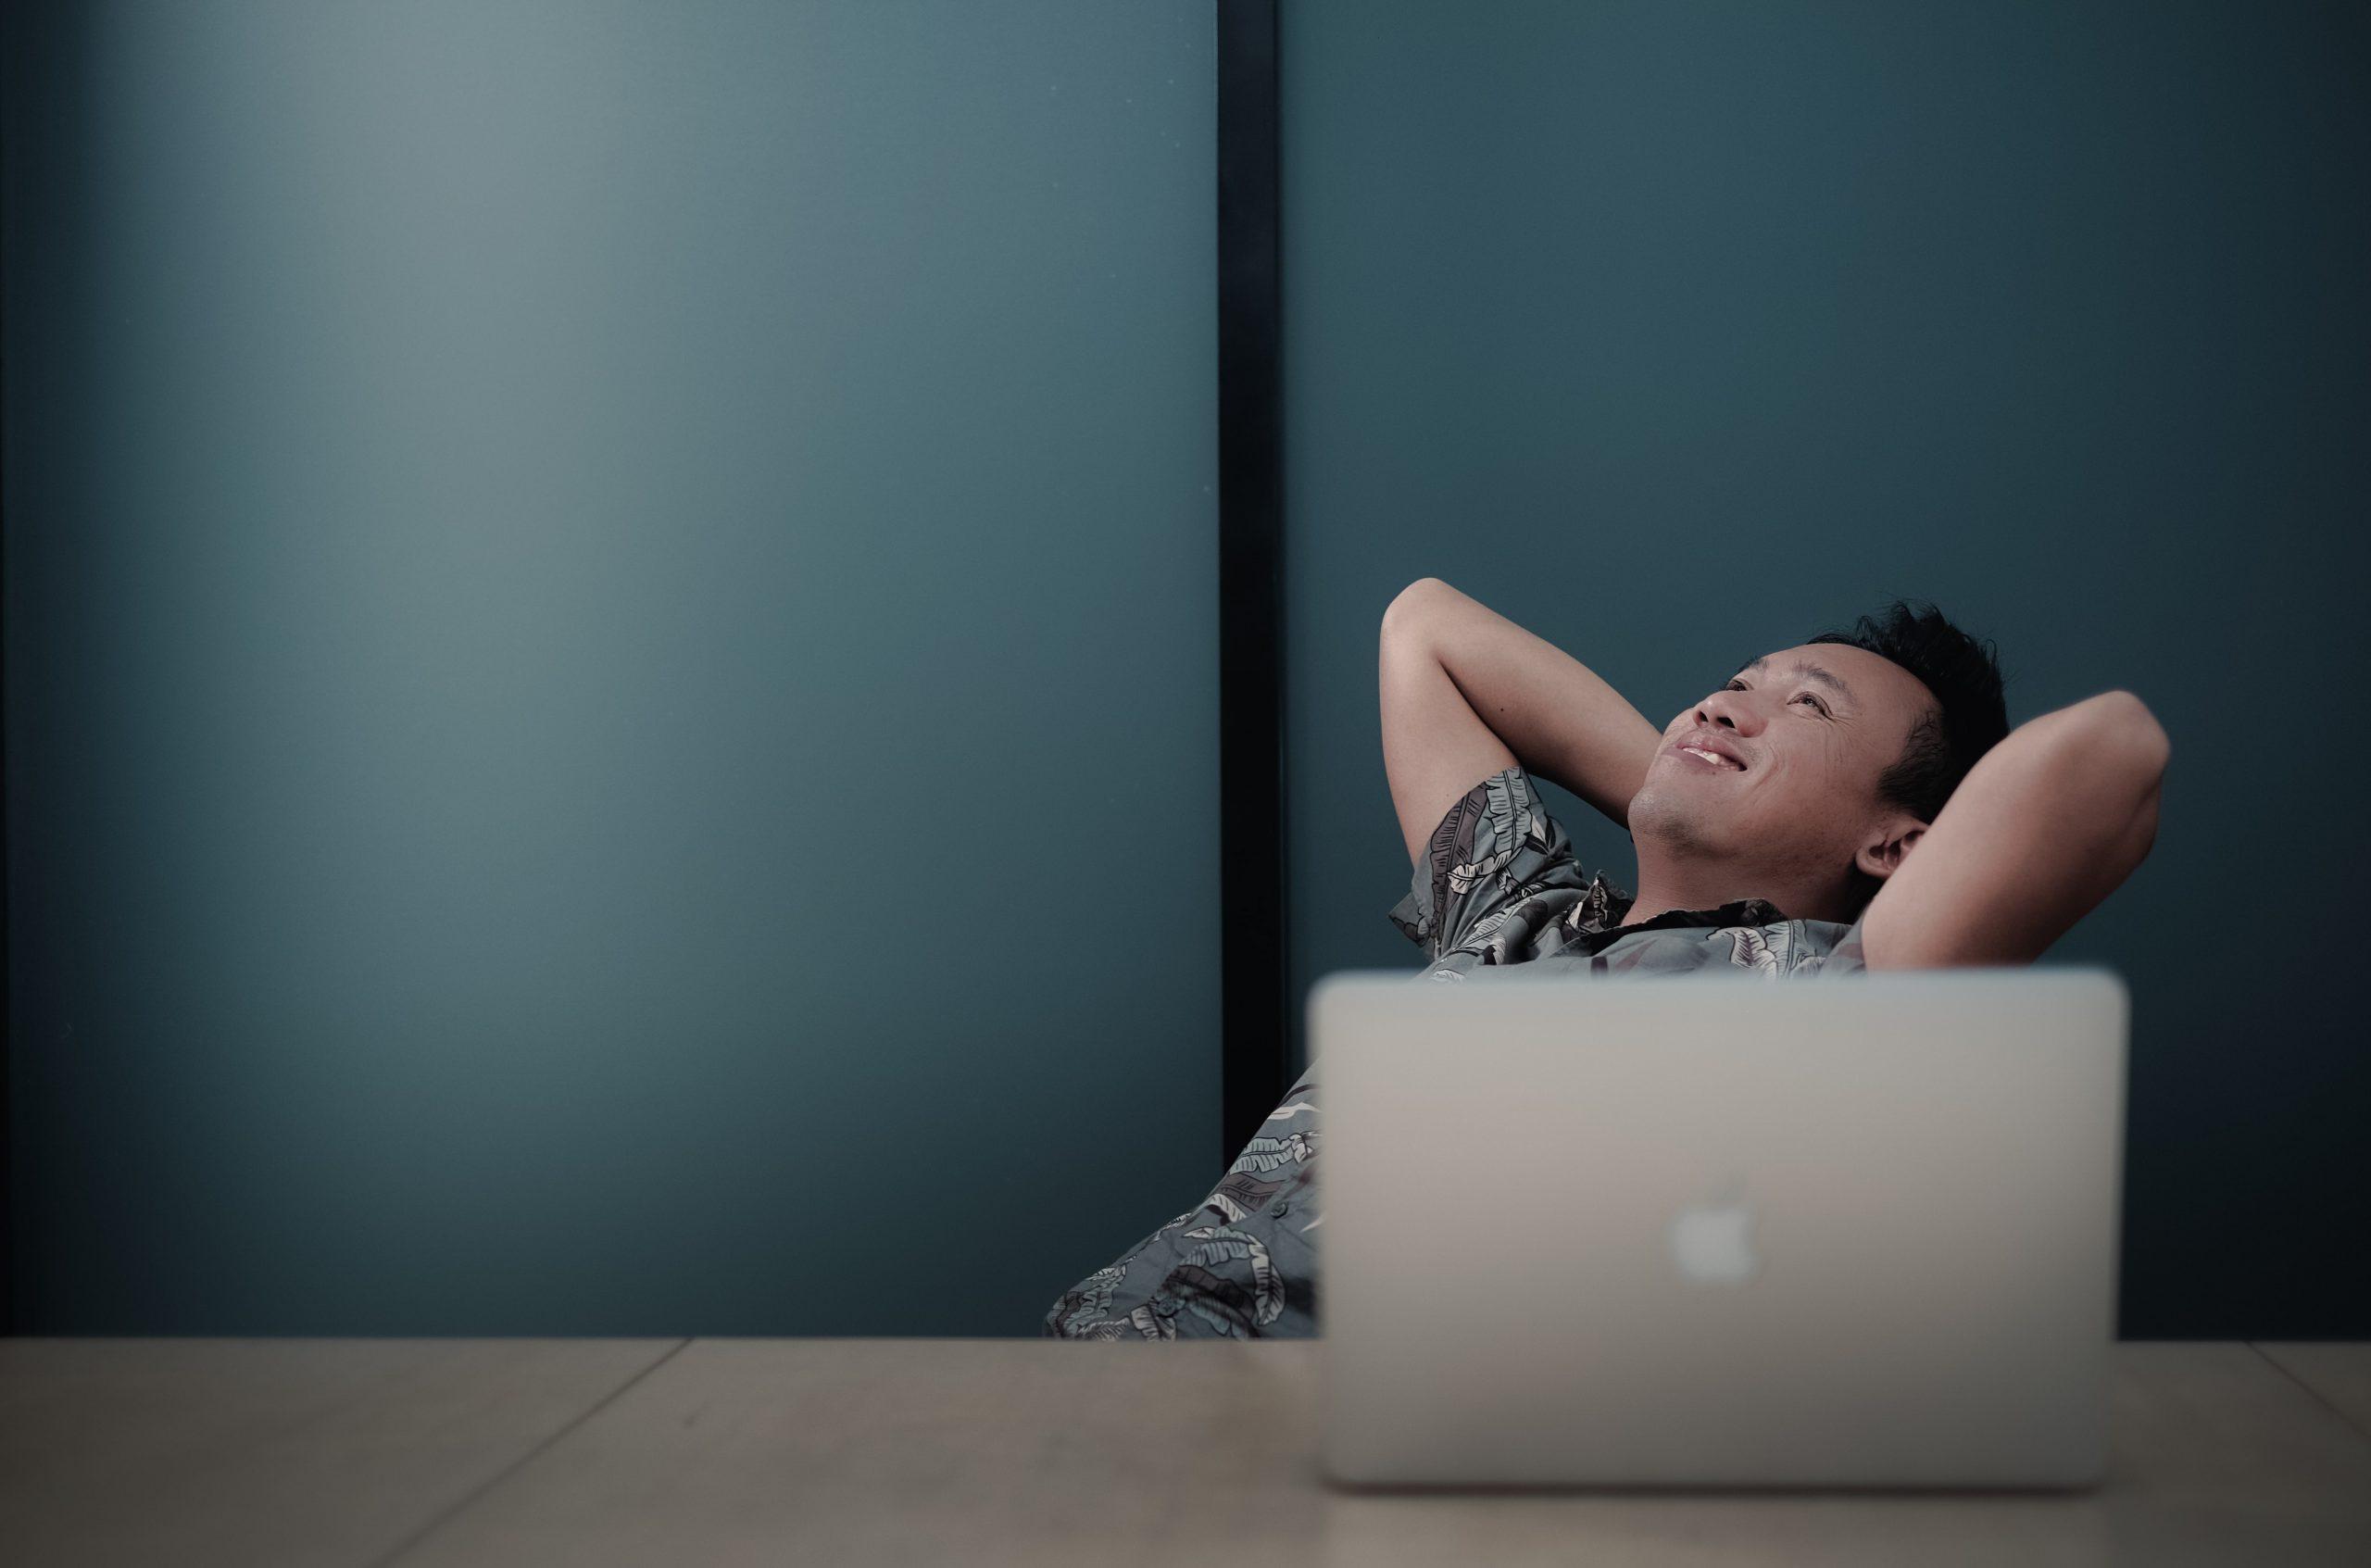 Happy man sitting behind a laptop